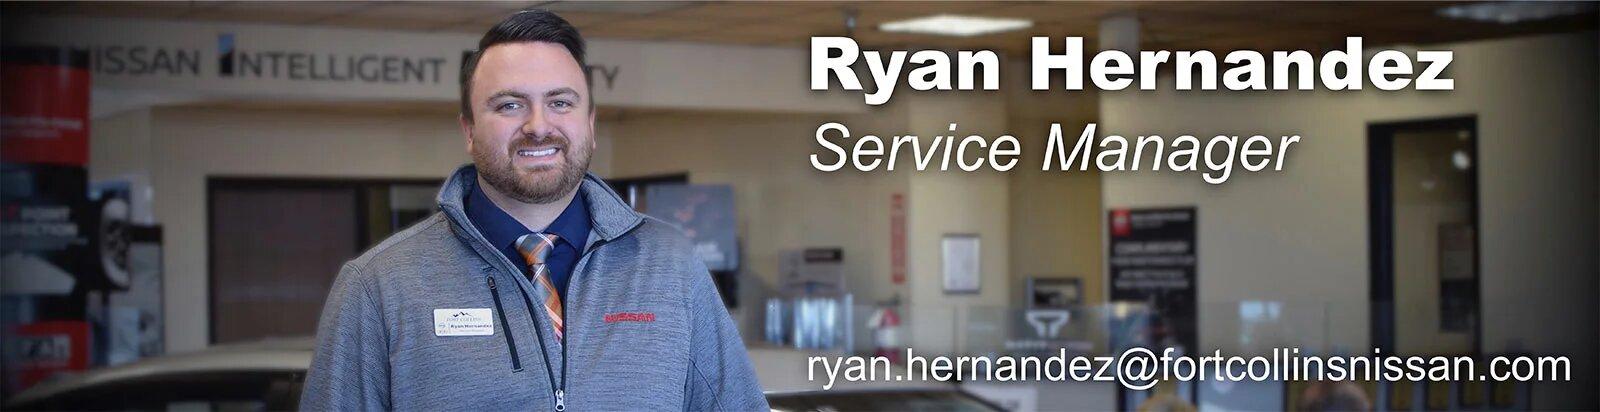 Service Manager Ryan Hernandez